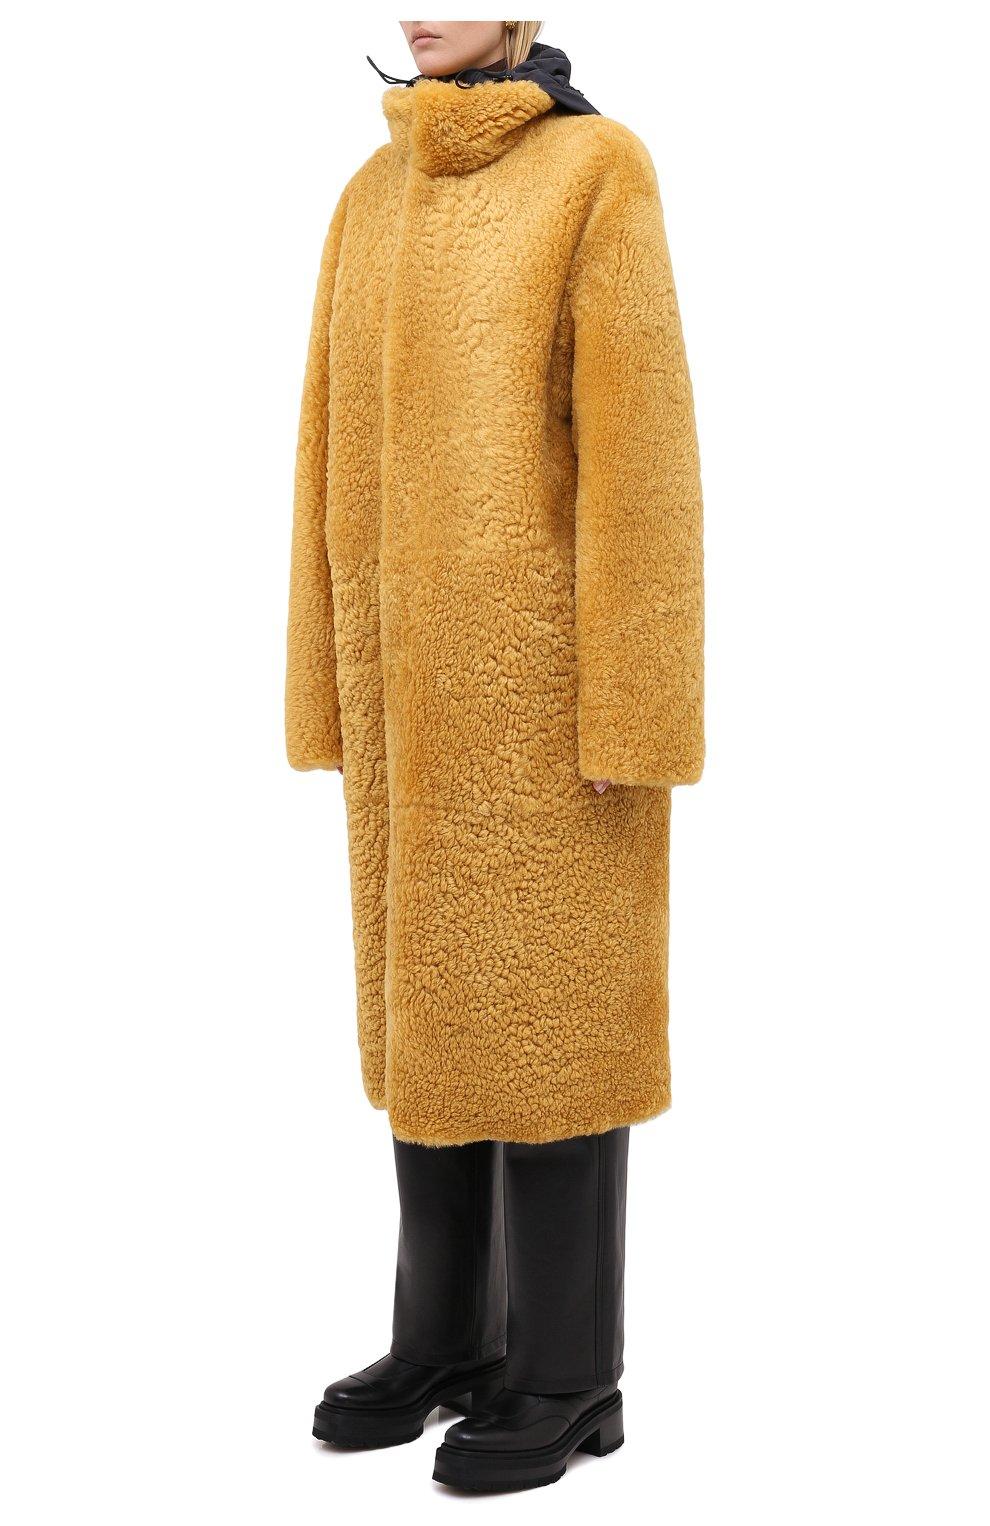 Женская шуба из овчины BOTTEGA VENETA желтого цвета, арт. 630407/VKV70 | Фото 3